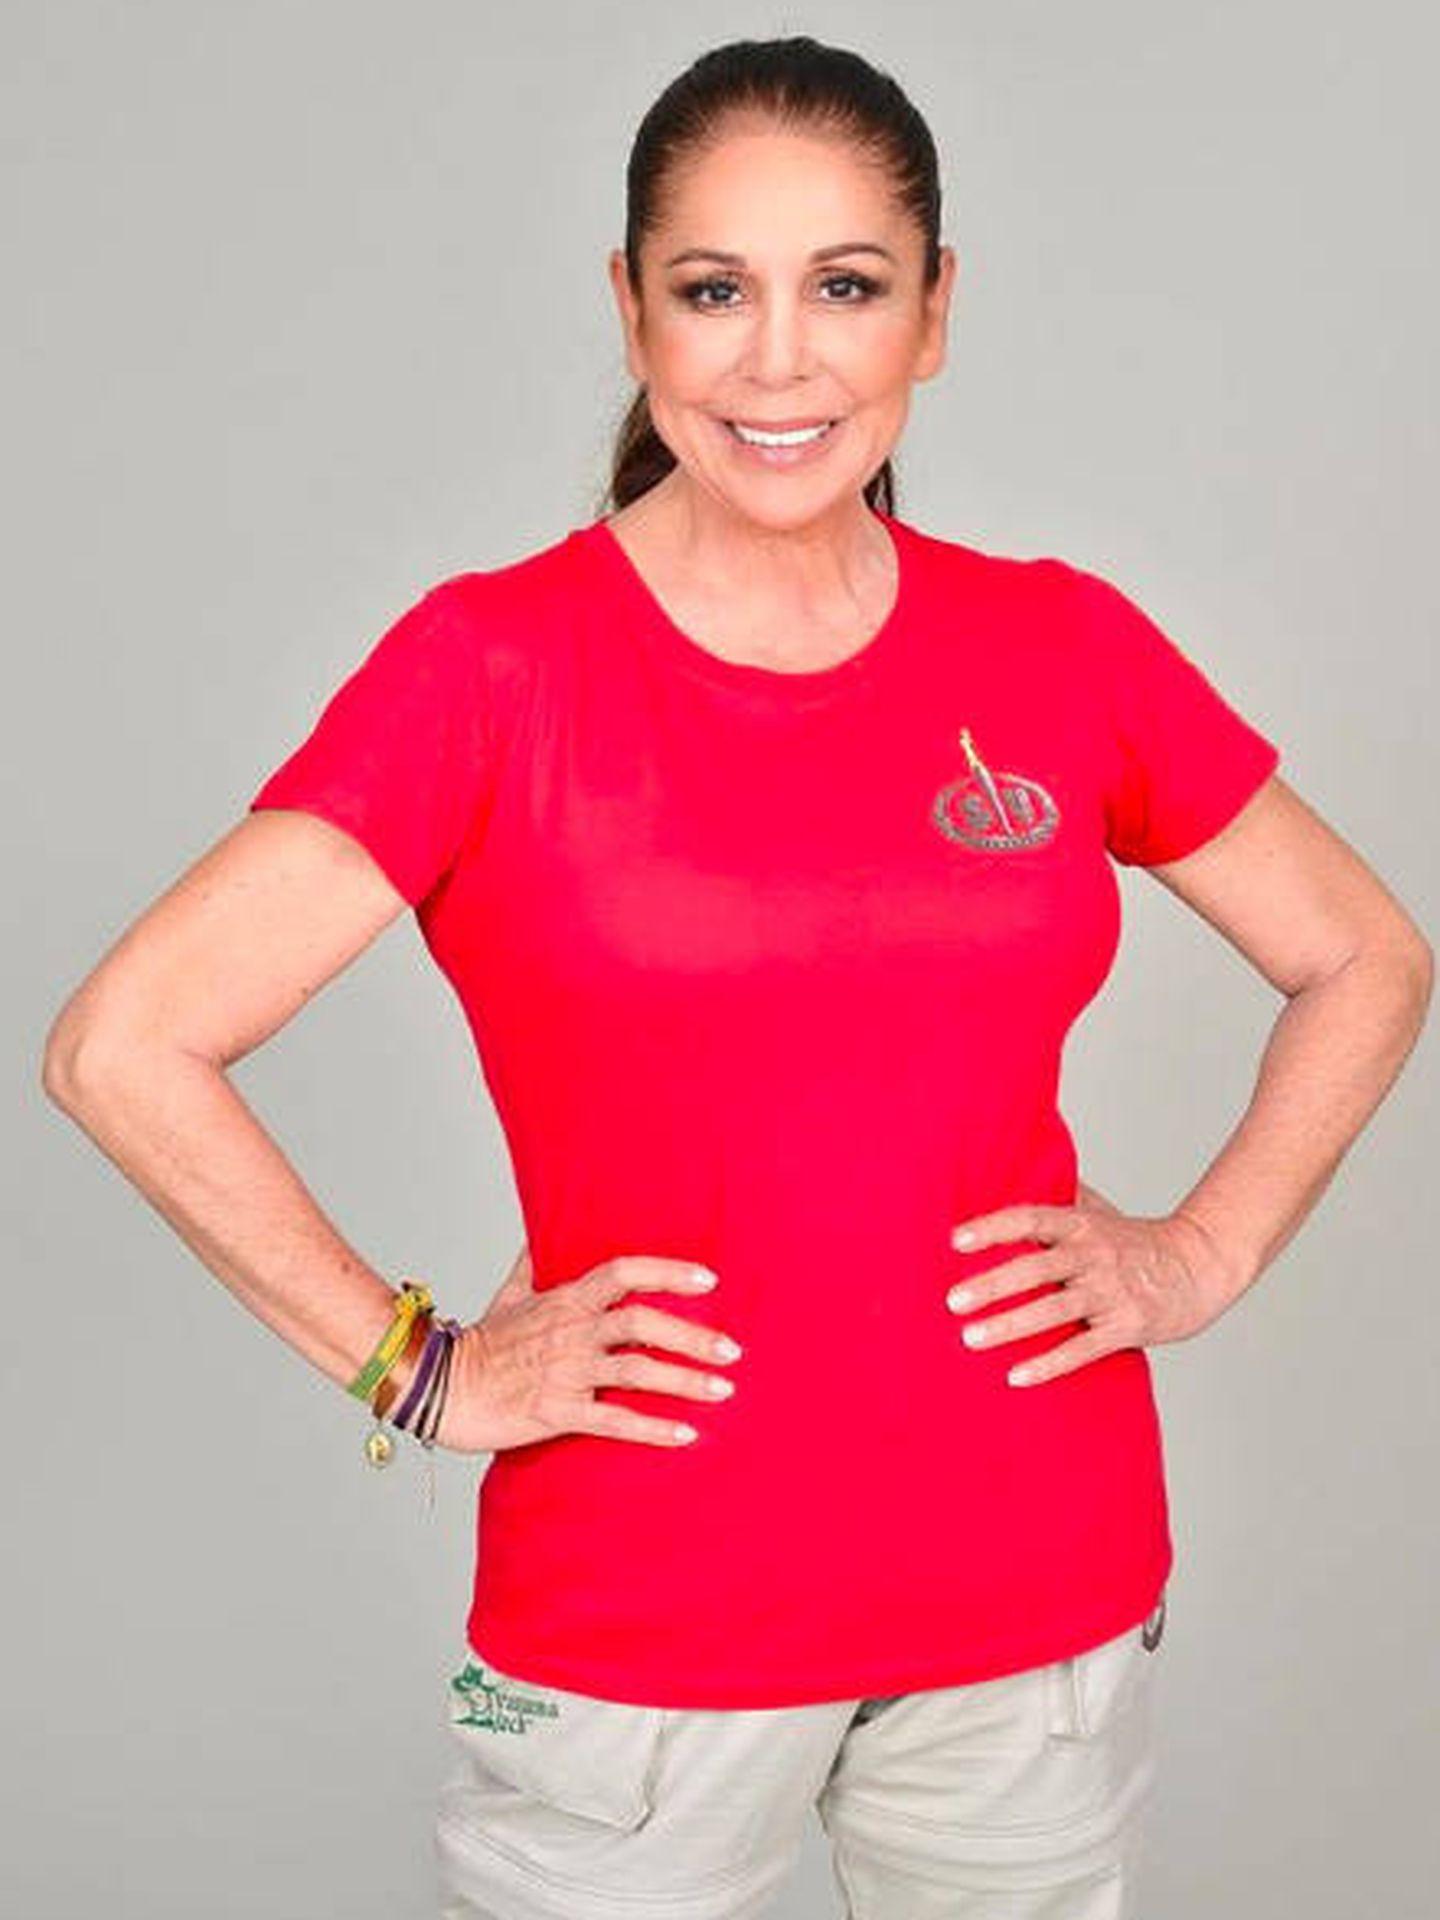 Isabel Pantoja, concursante de 'Supervivientes'. (Instagram: @isabel_pantoja_martin)